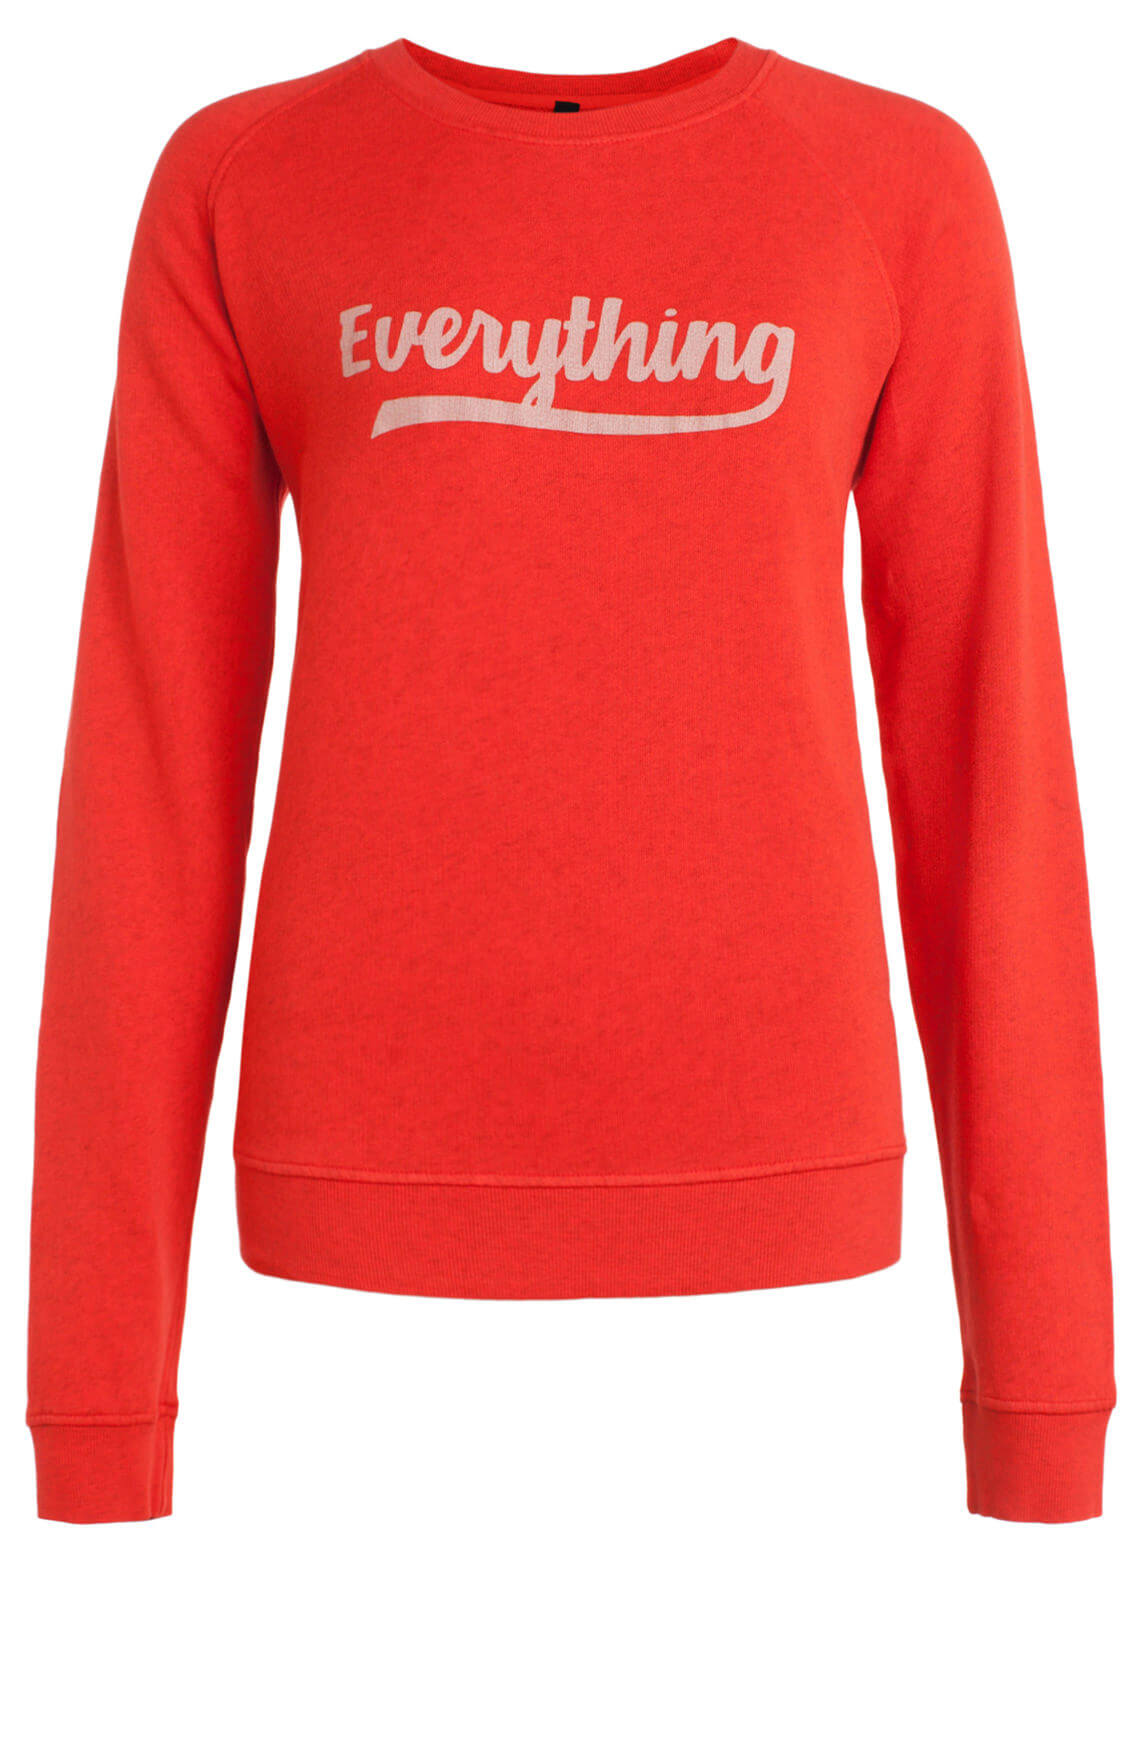 10 Days Dames Sweater met tekst Rood